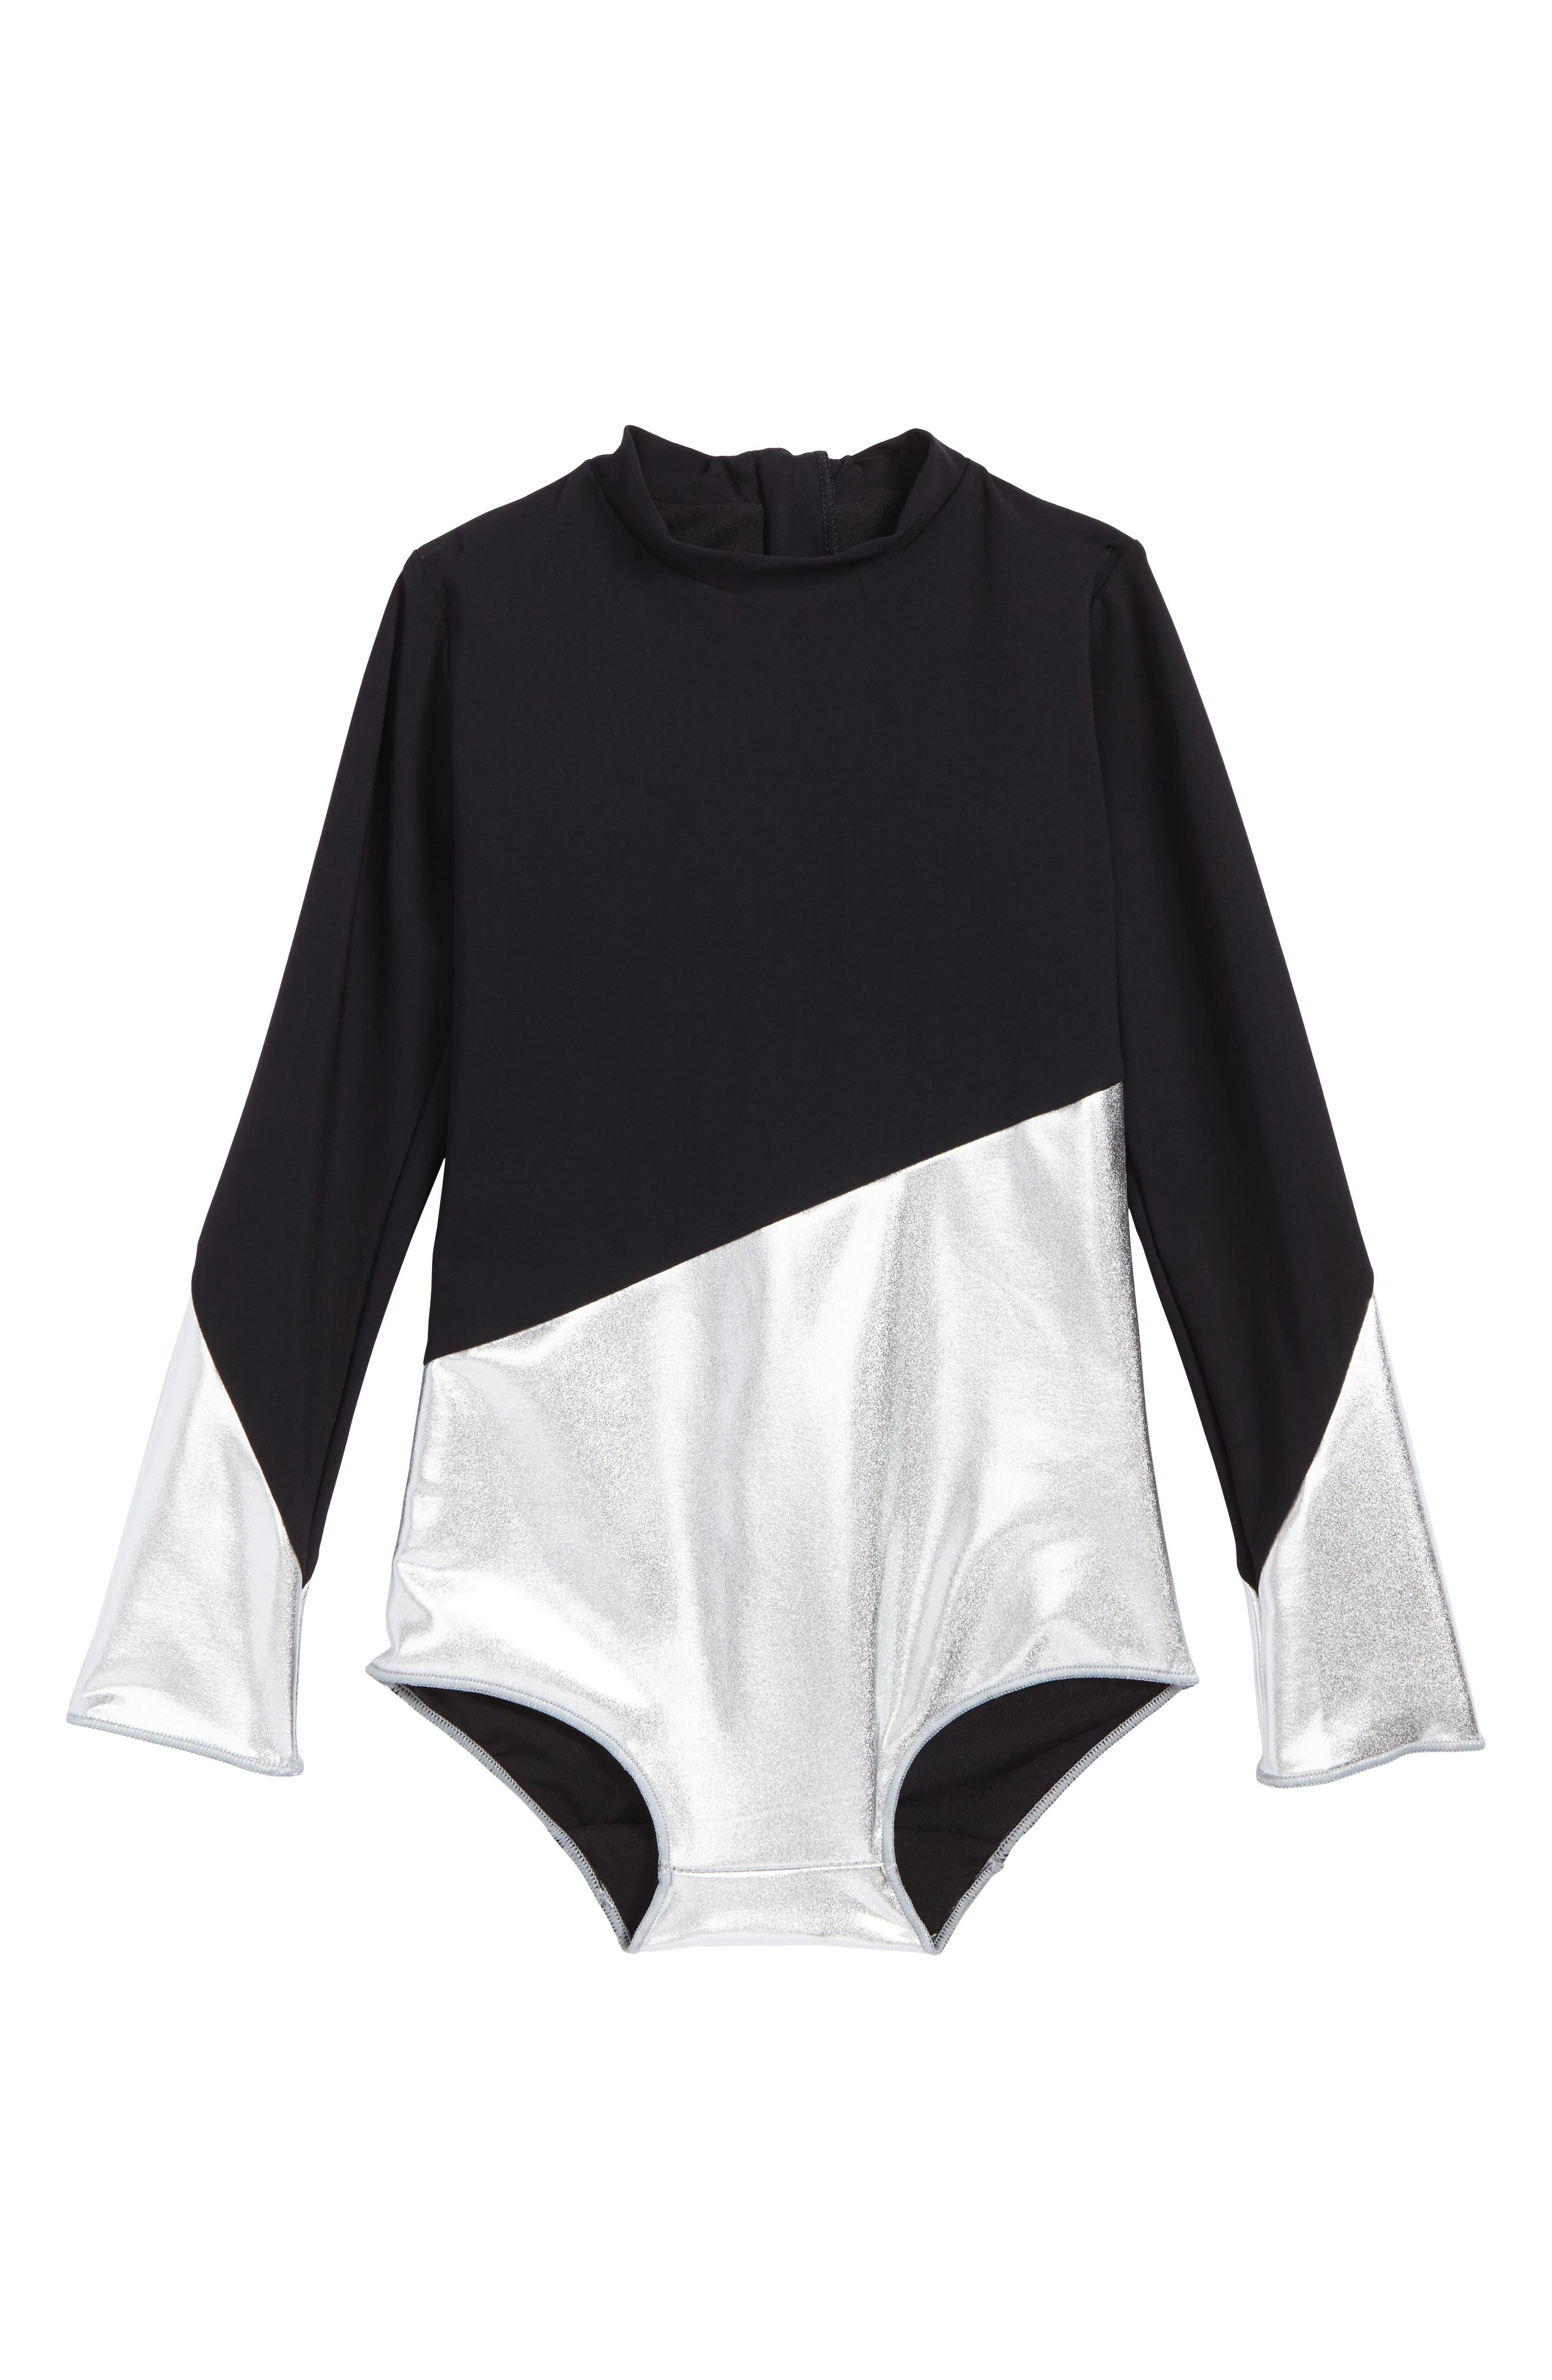 Main Image - Nununu Long Sleeve One-Piece Swimsuit (Toddler Girls & Little Girls)